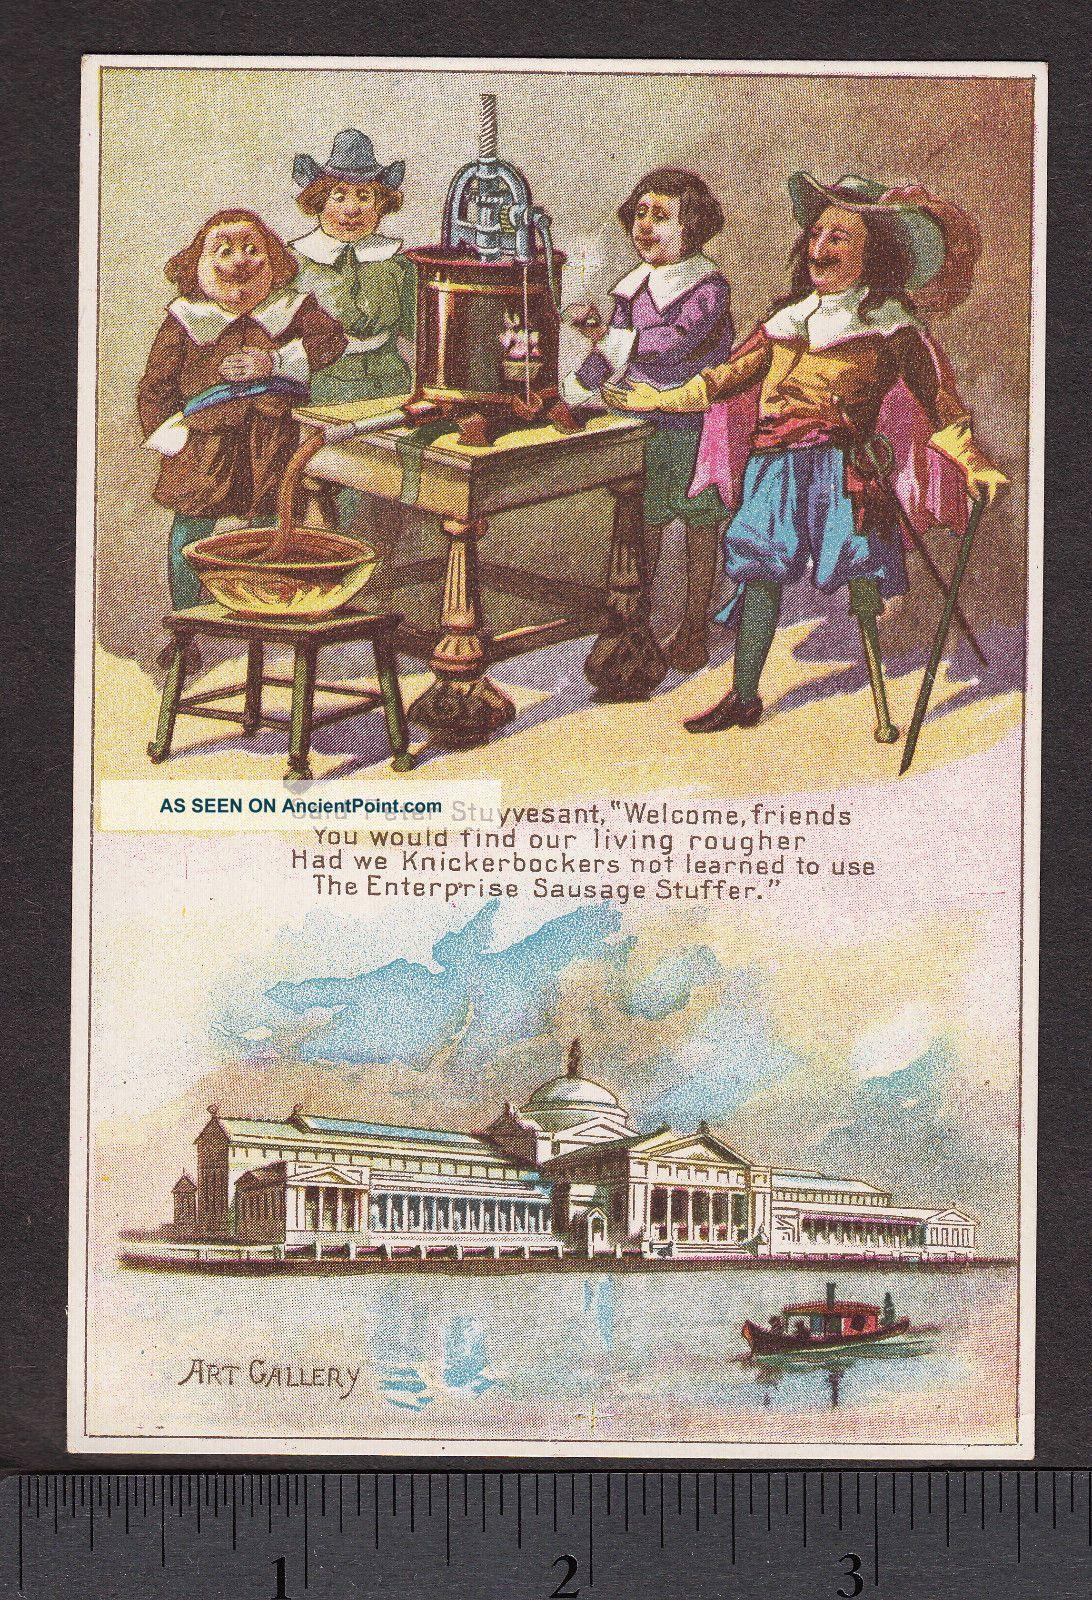 Antique C.  1893 Enterprise Sausage Stuffer Meat Grinder Chicago Worlds Fair Card Meat Grinders photo